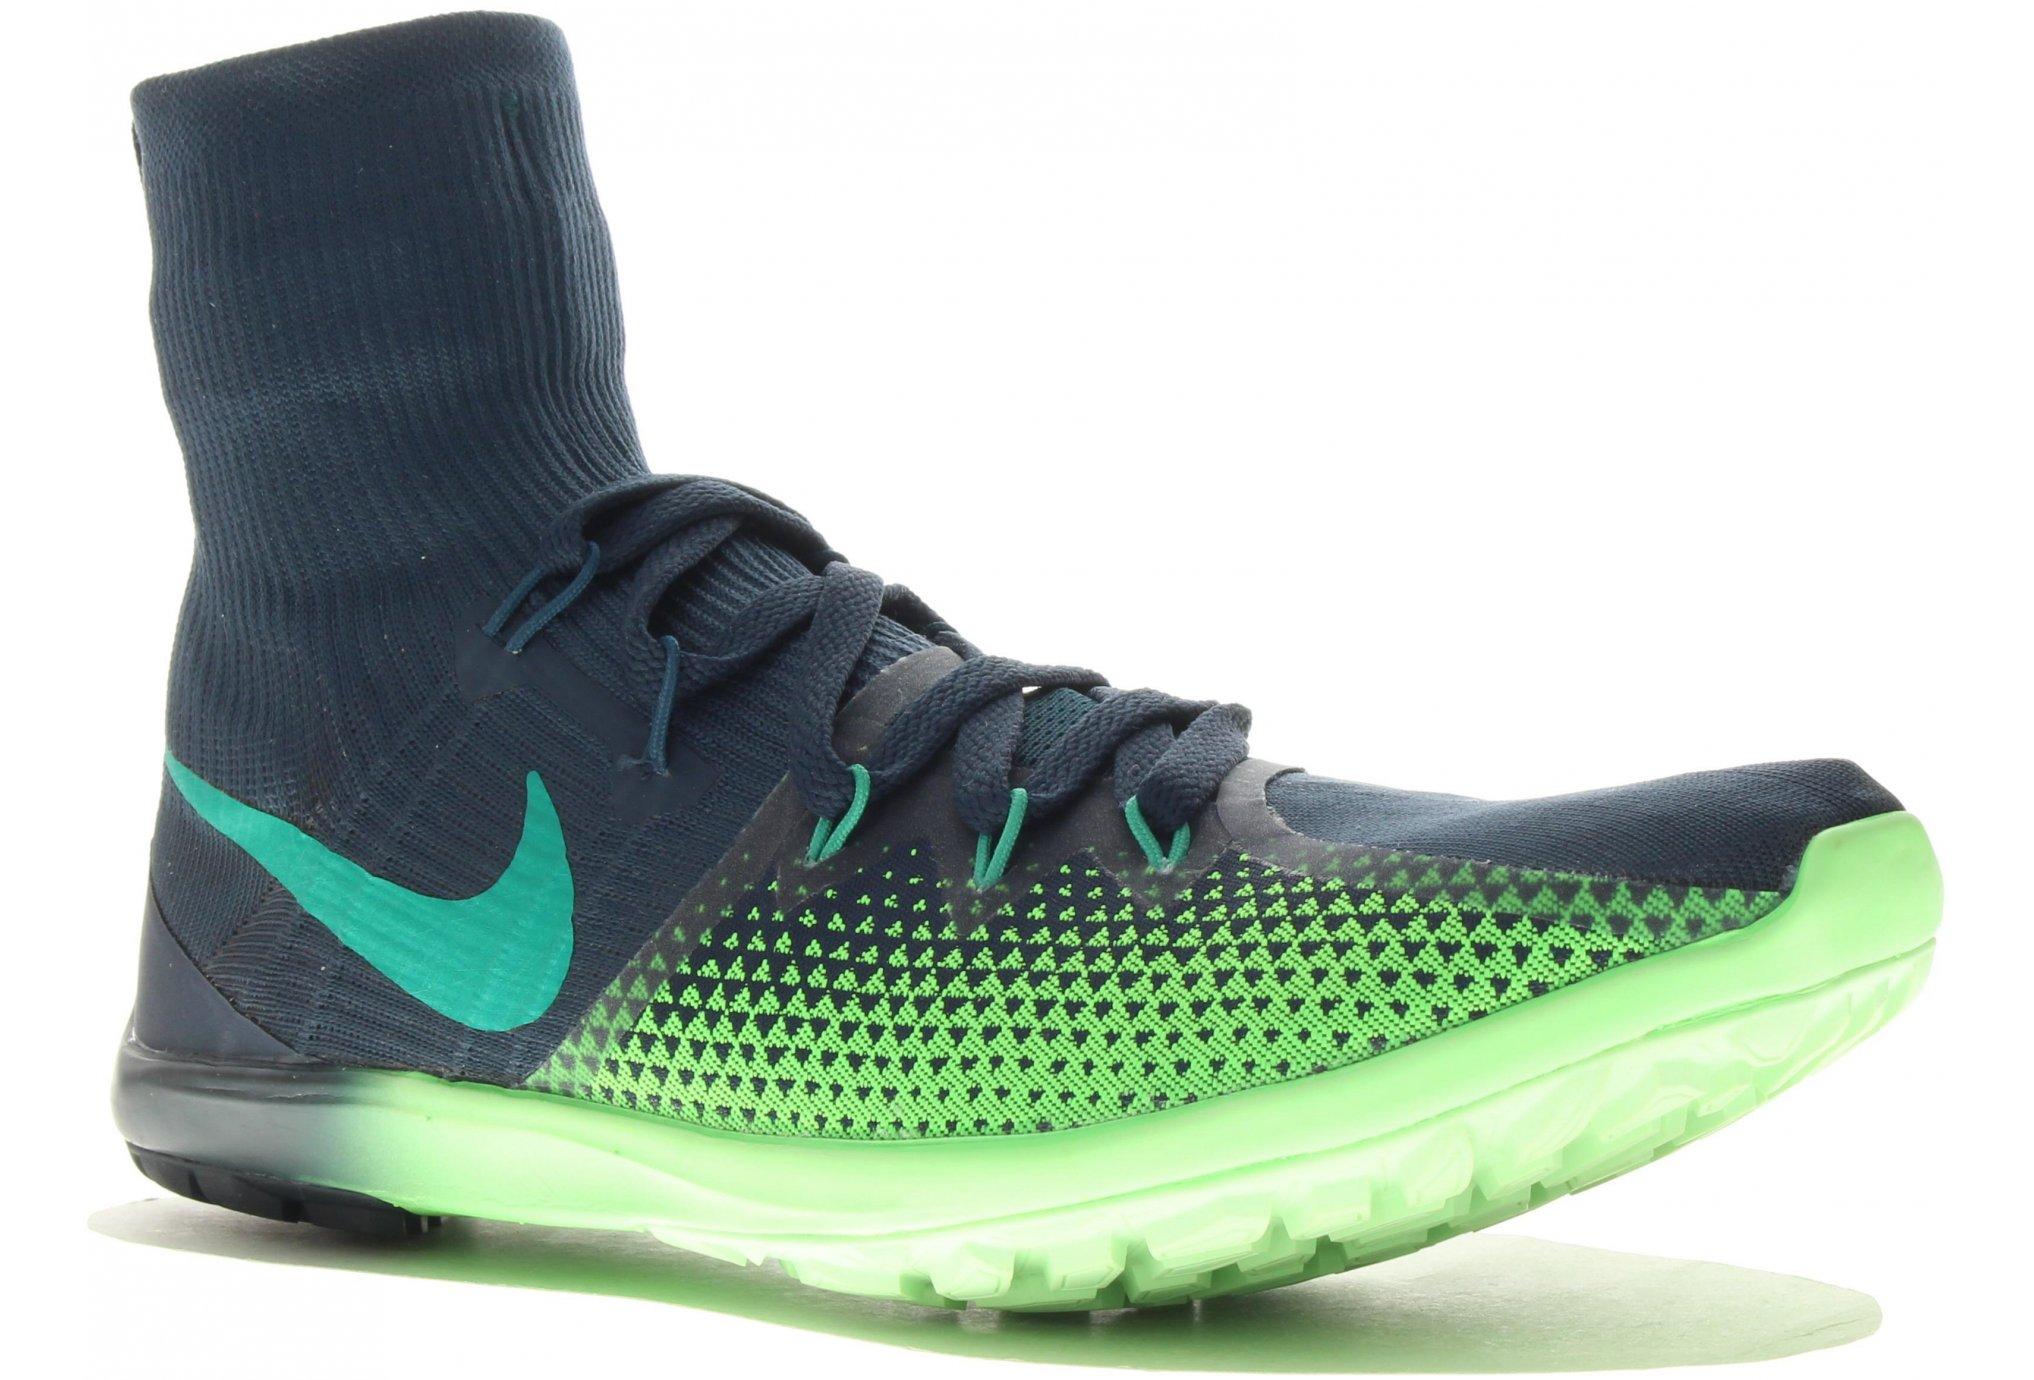 Nike Zoom Victory Waffle 4 M Diététique Chaussures homme